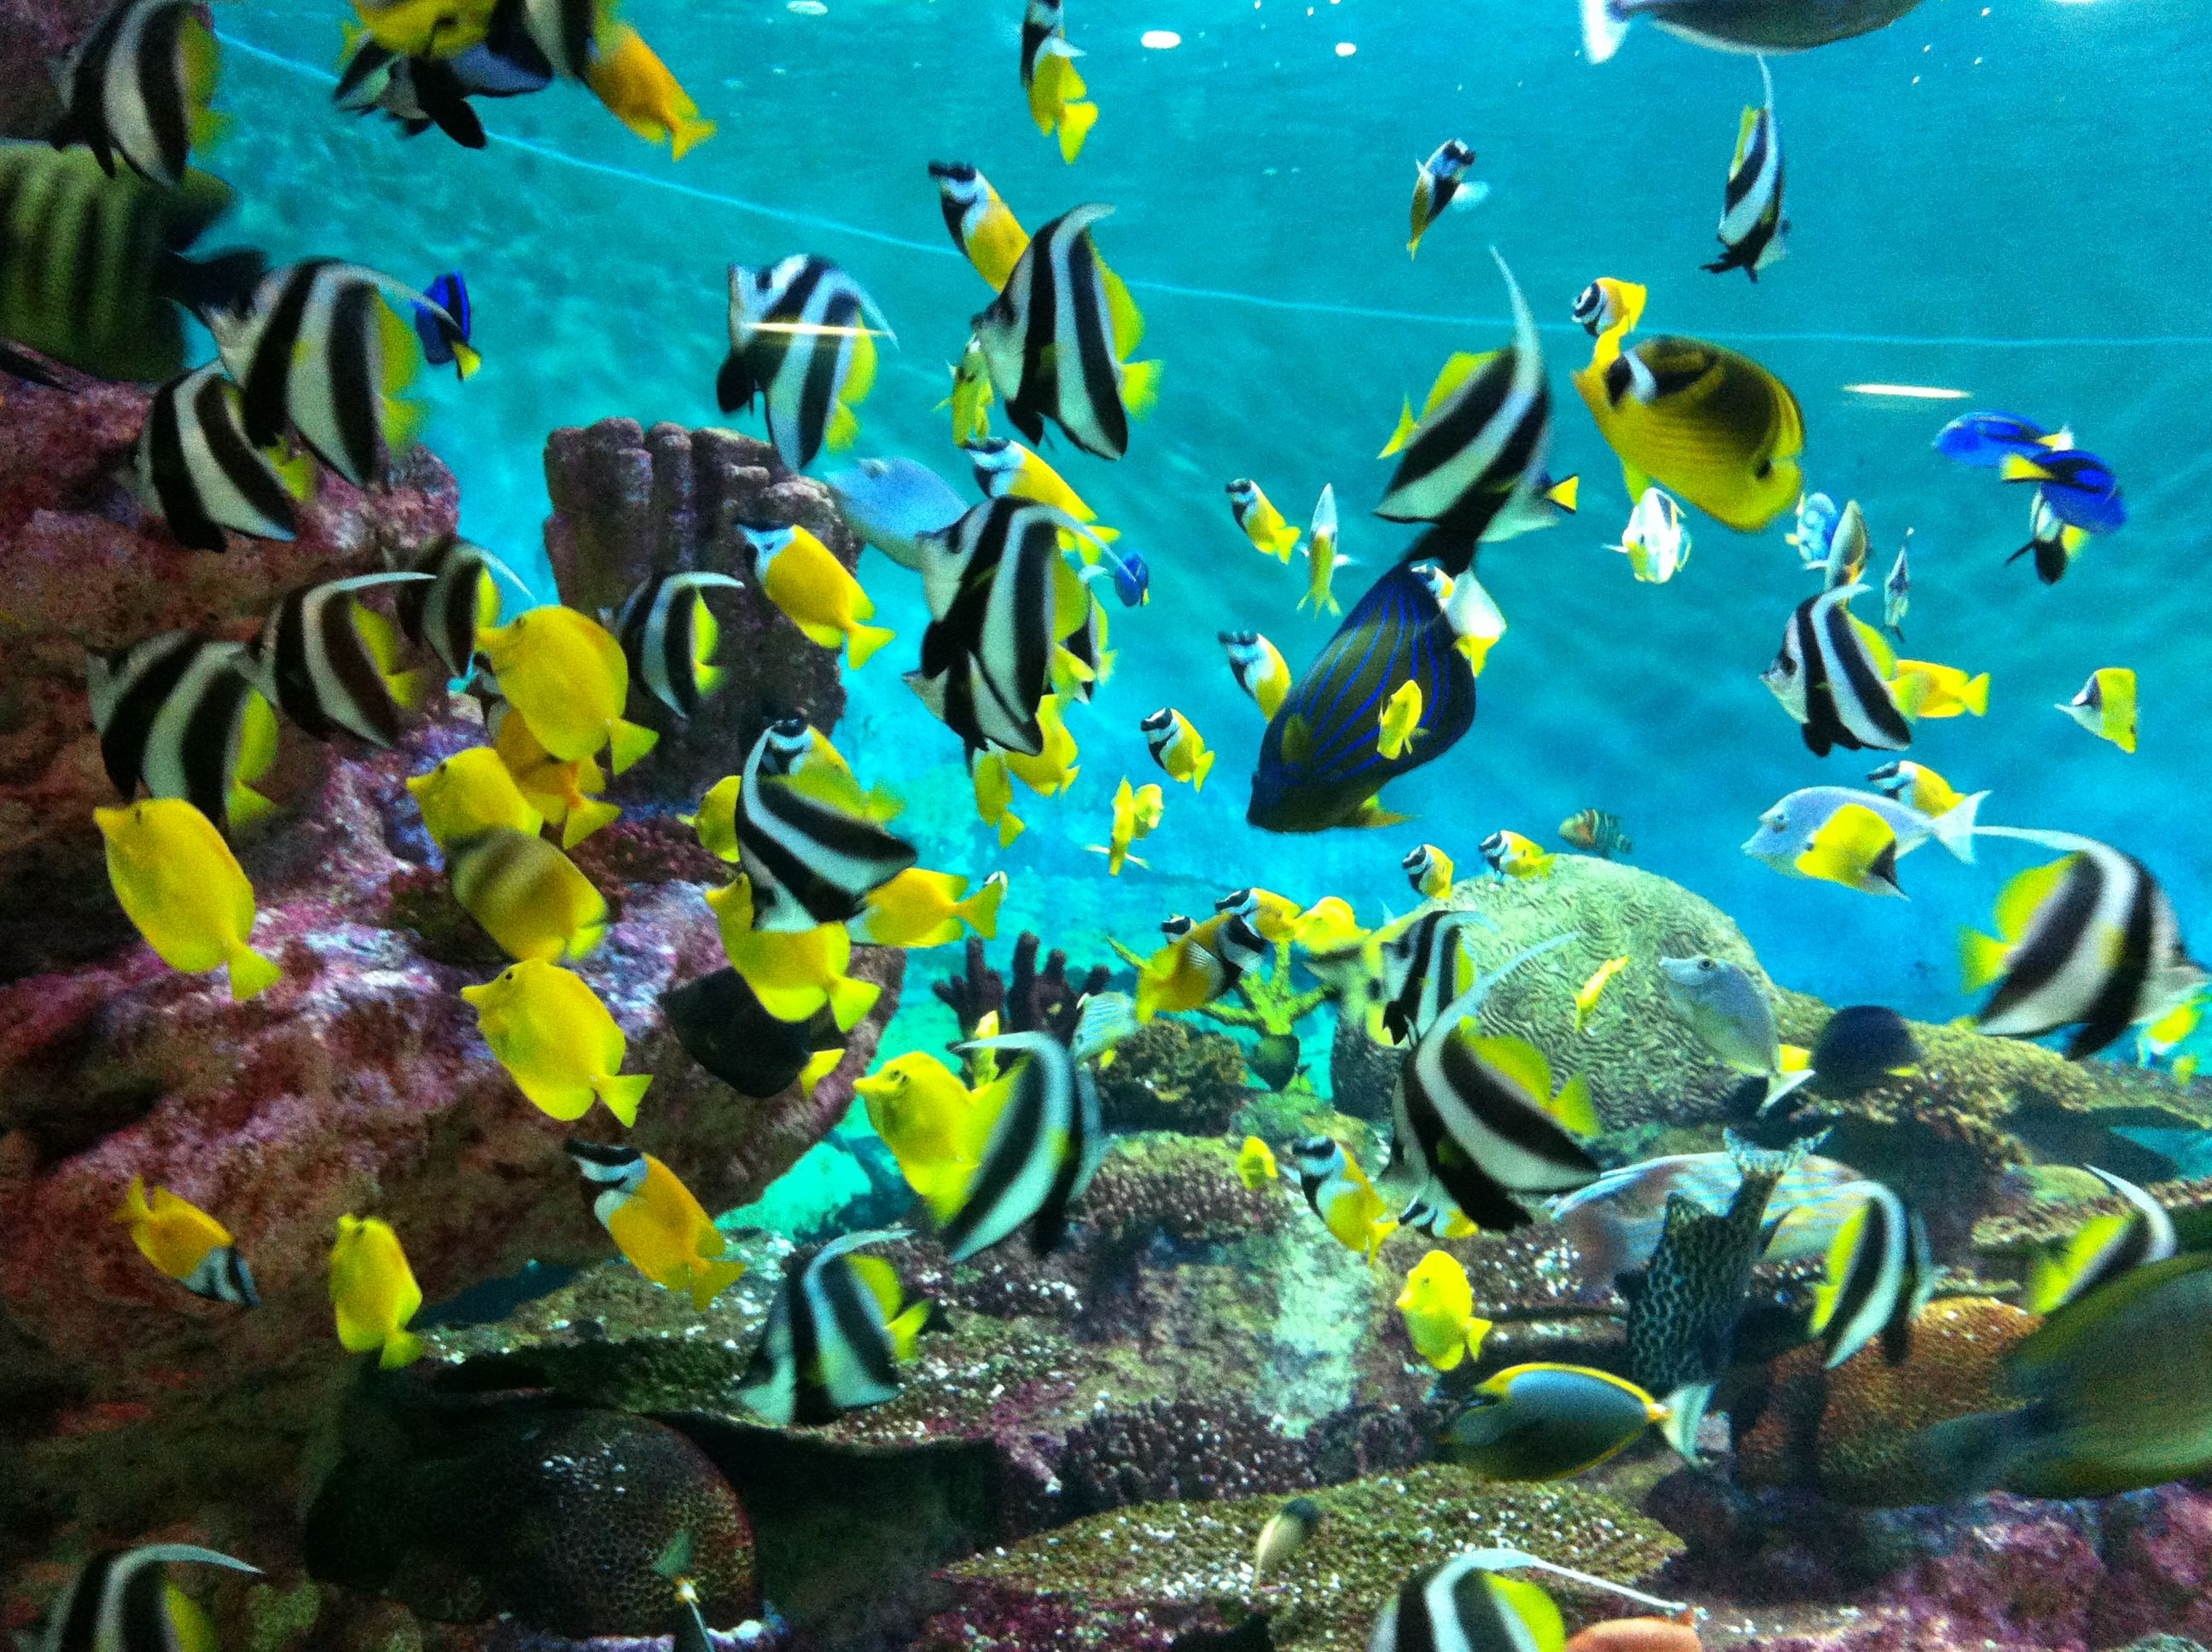 hd aquarium wallpaper o oshenka Pinterest